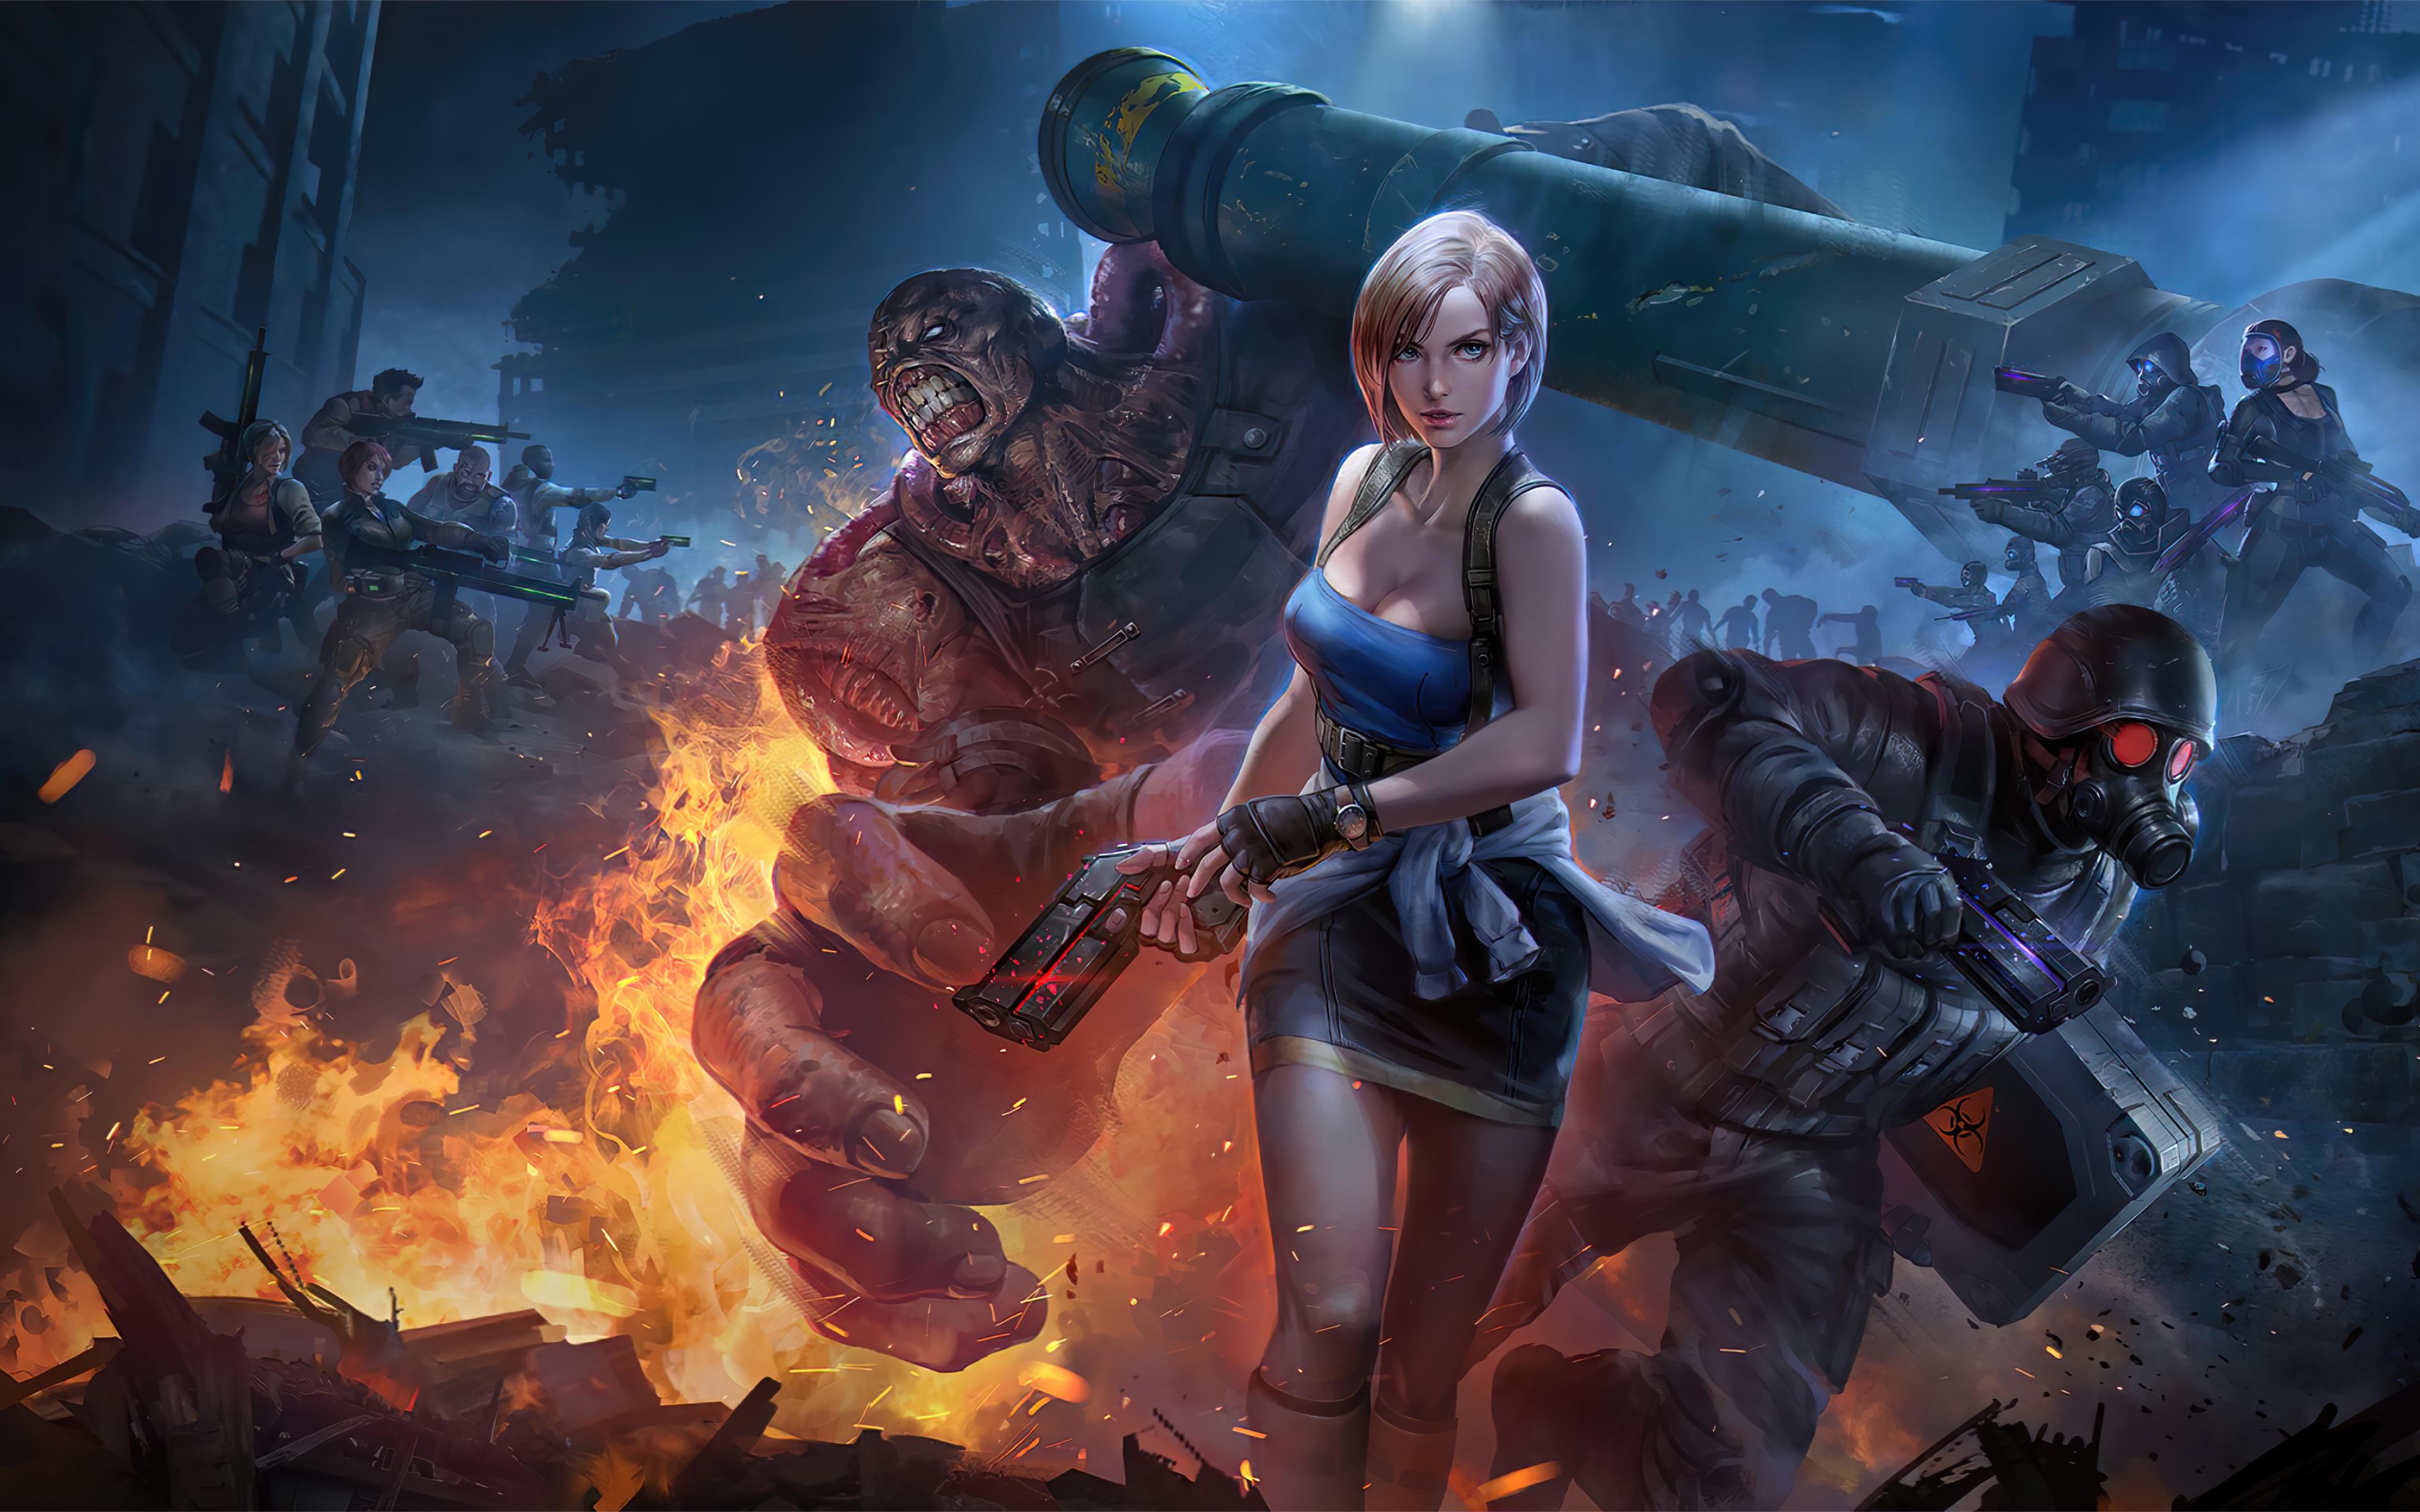 3840x2400 Resident Evil 2020 4K 3840x2400 Resolution ...